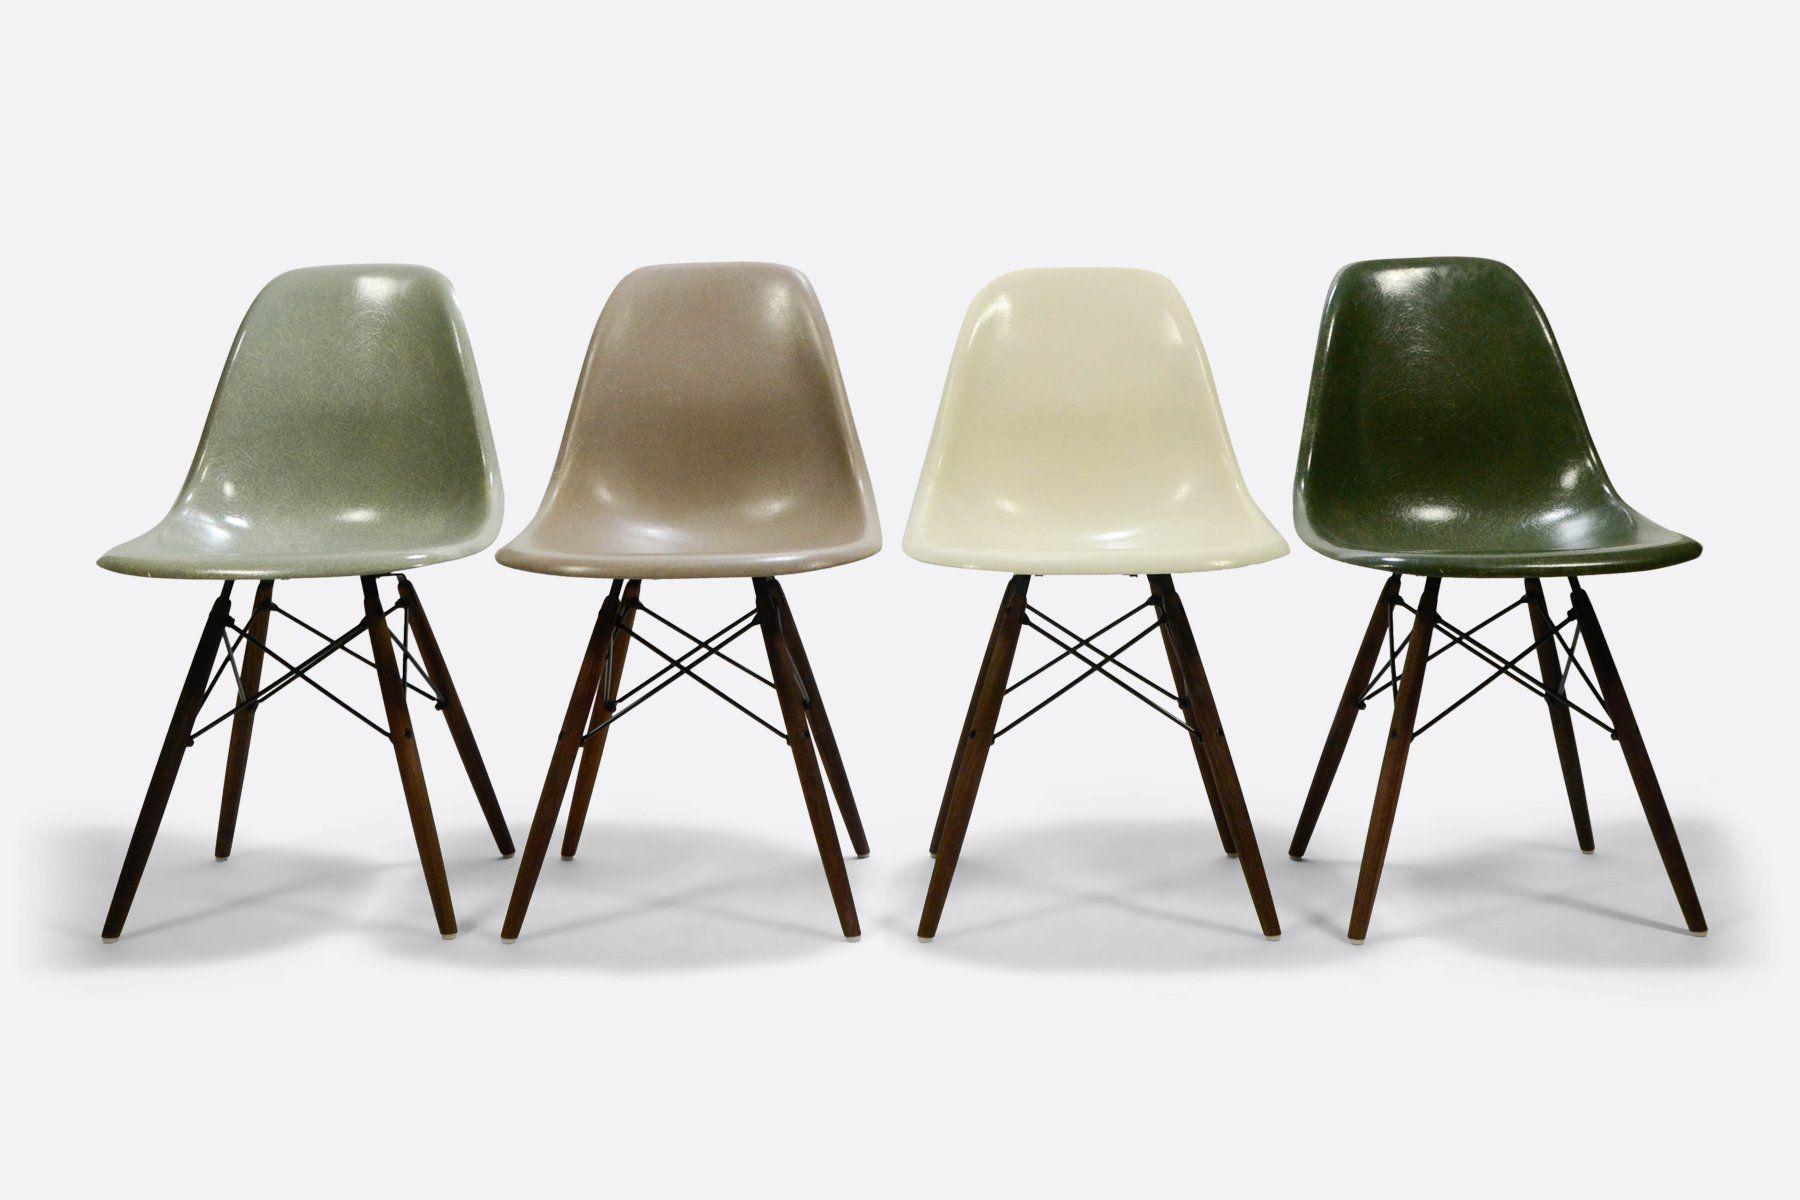 Multiset Of Rare Colors Eames Dsw Dsx Dsr Herman Miller Vitra Design Eames Fiberglass Chair Vintage Eames Eames Dsw Chair